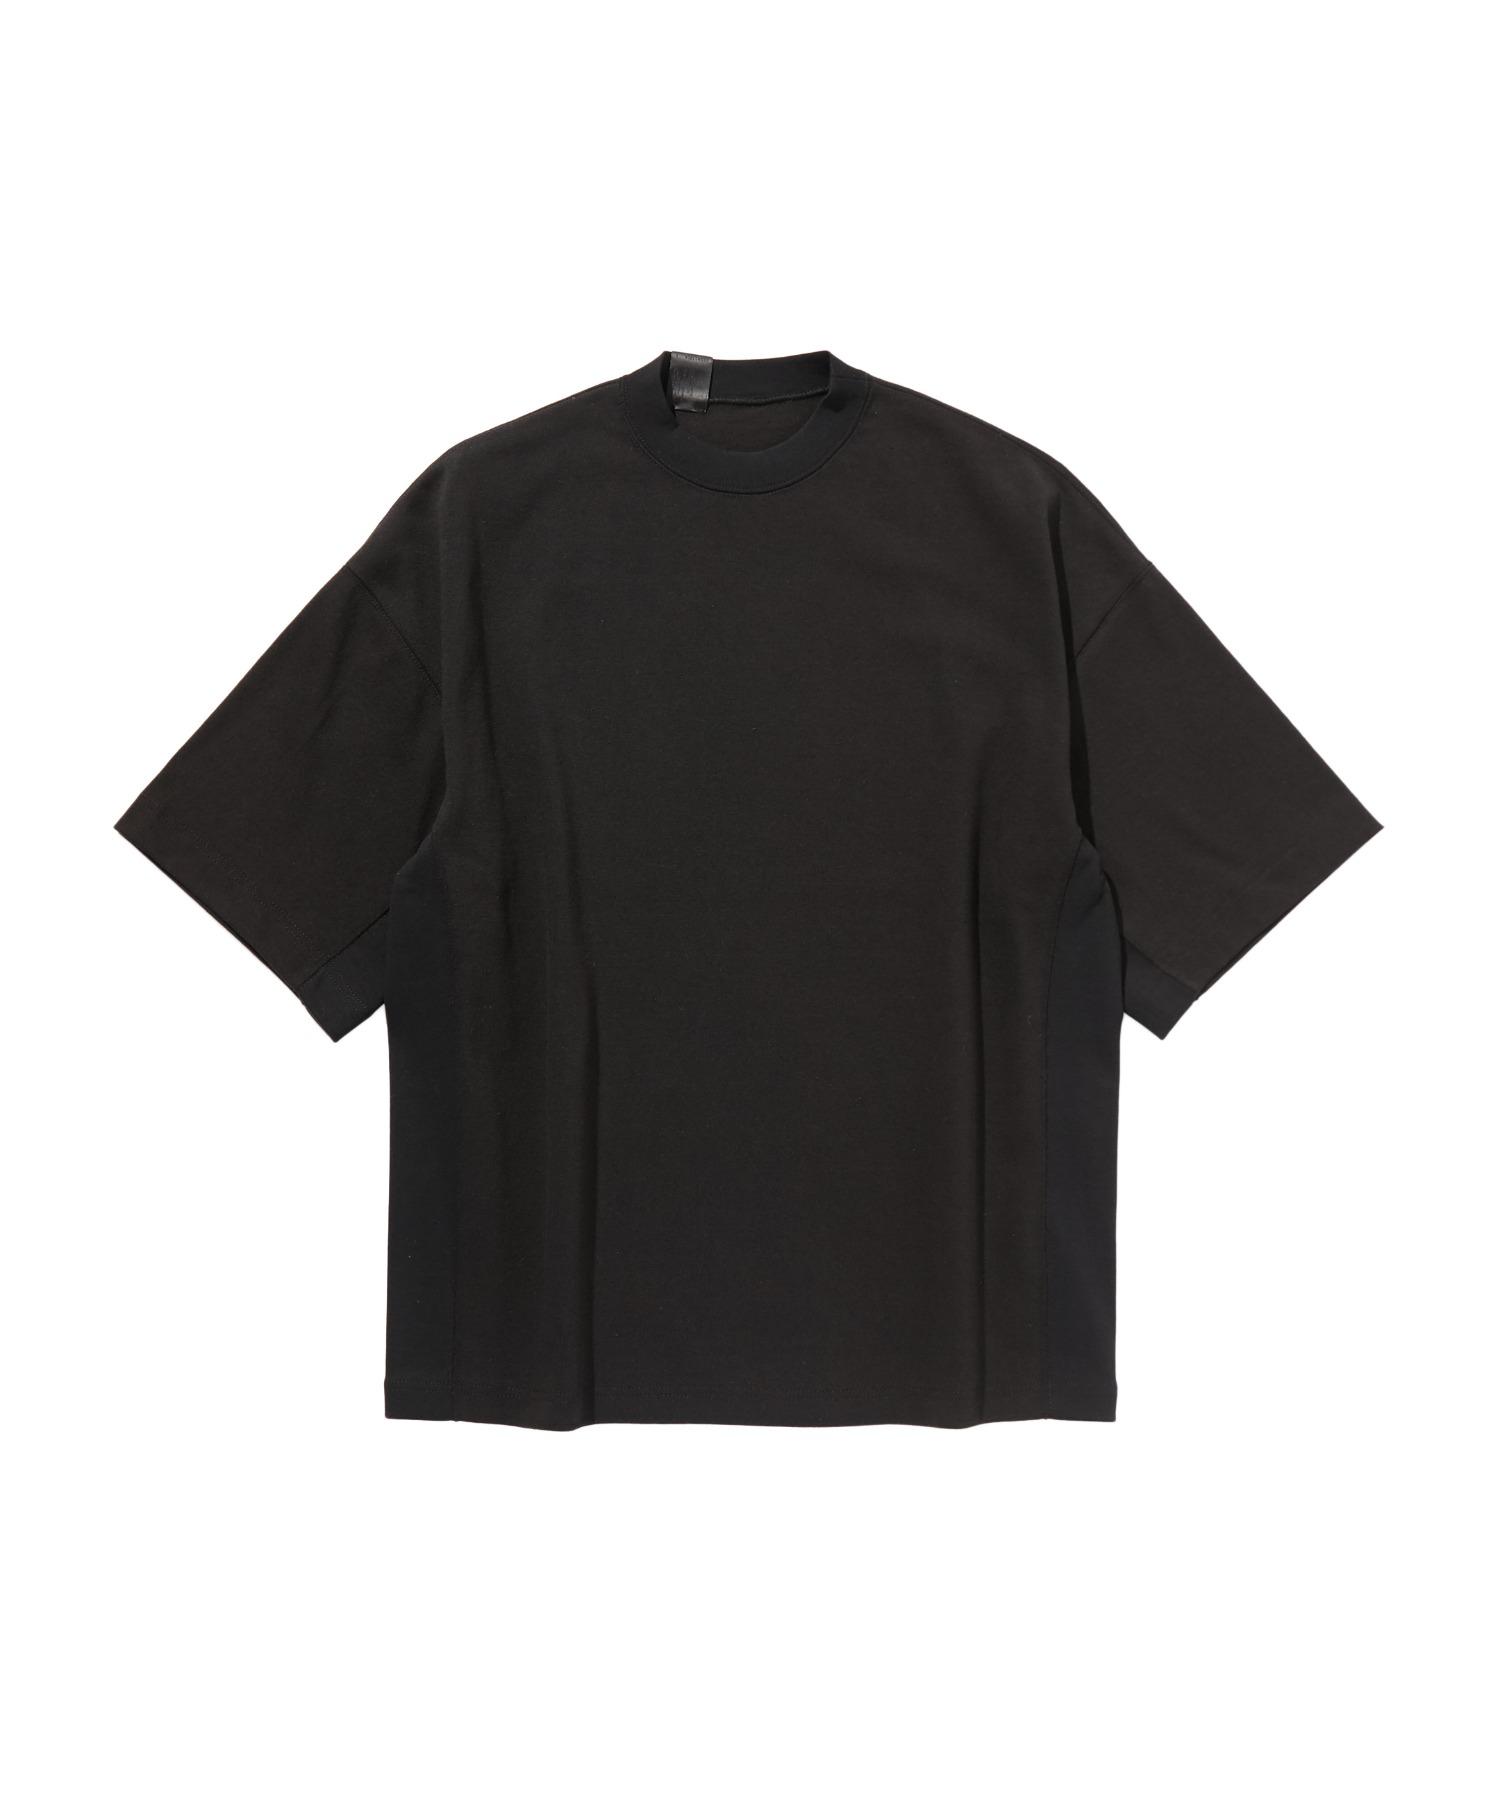 SPRING2020 CREW NECK T-SHIRT